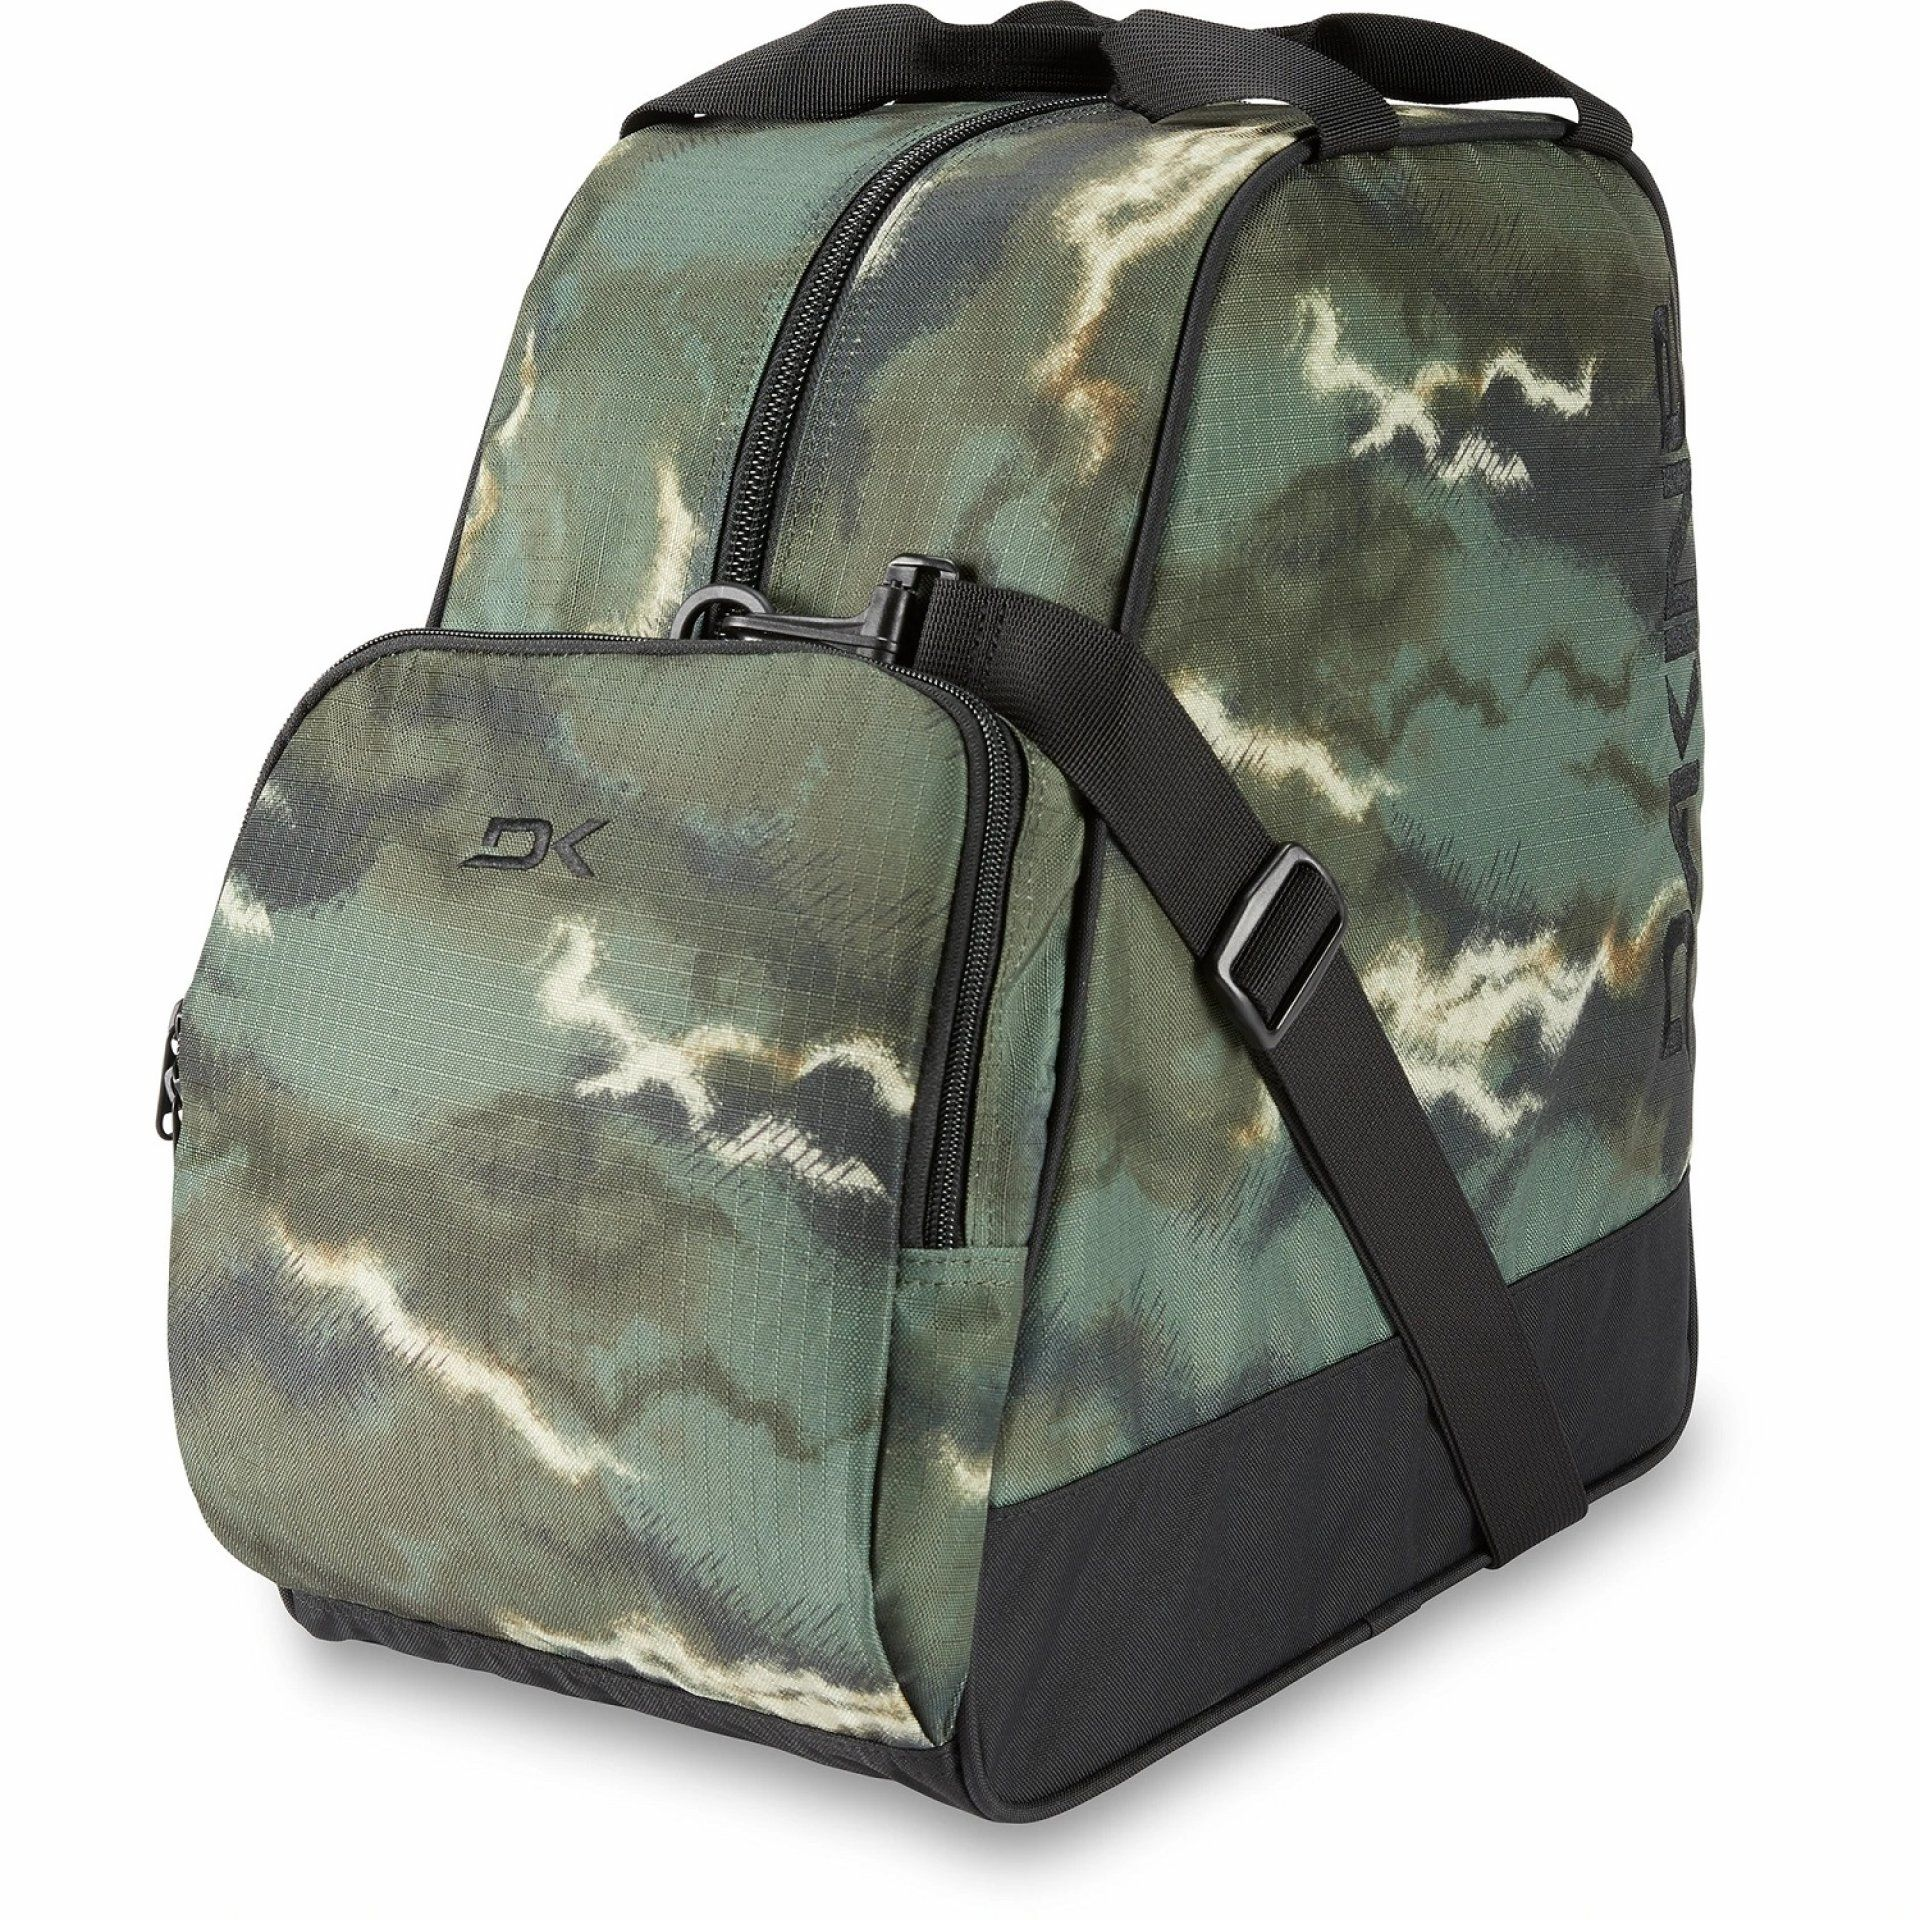 TORBA NA BUTY DAKINE BOOT BAG 30L OLIVE ASHCROFT CAMO